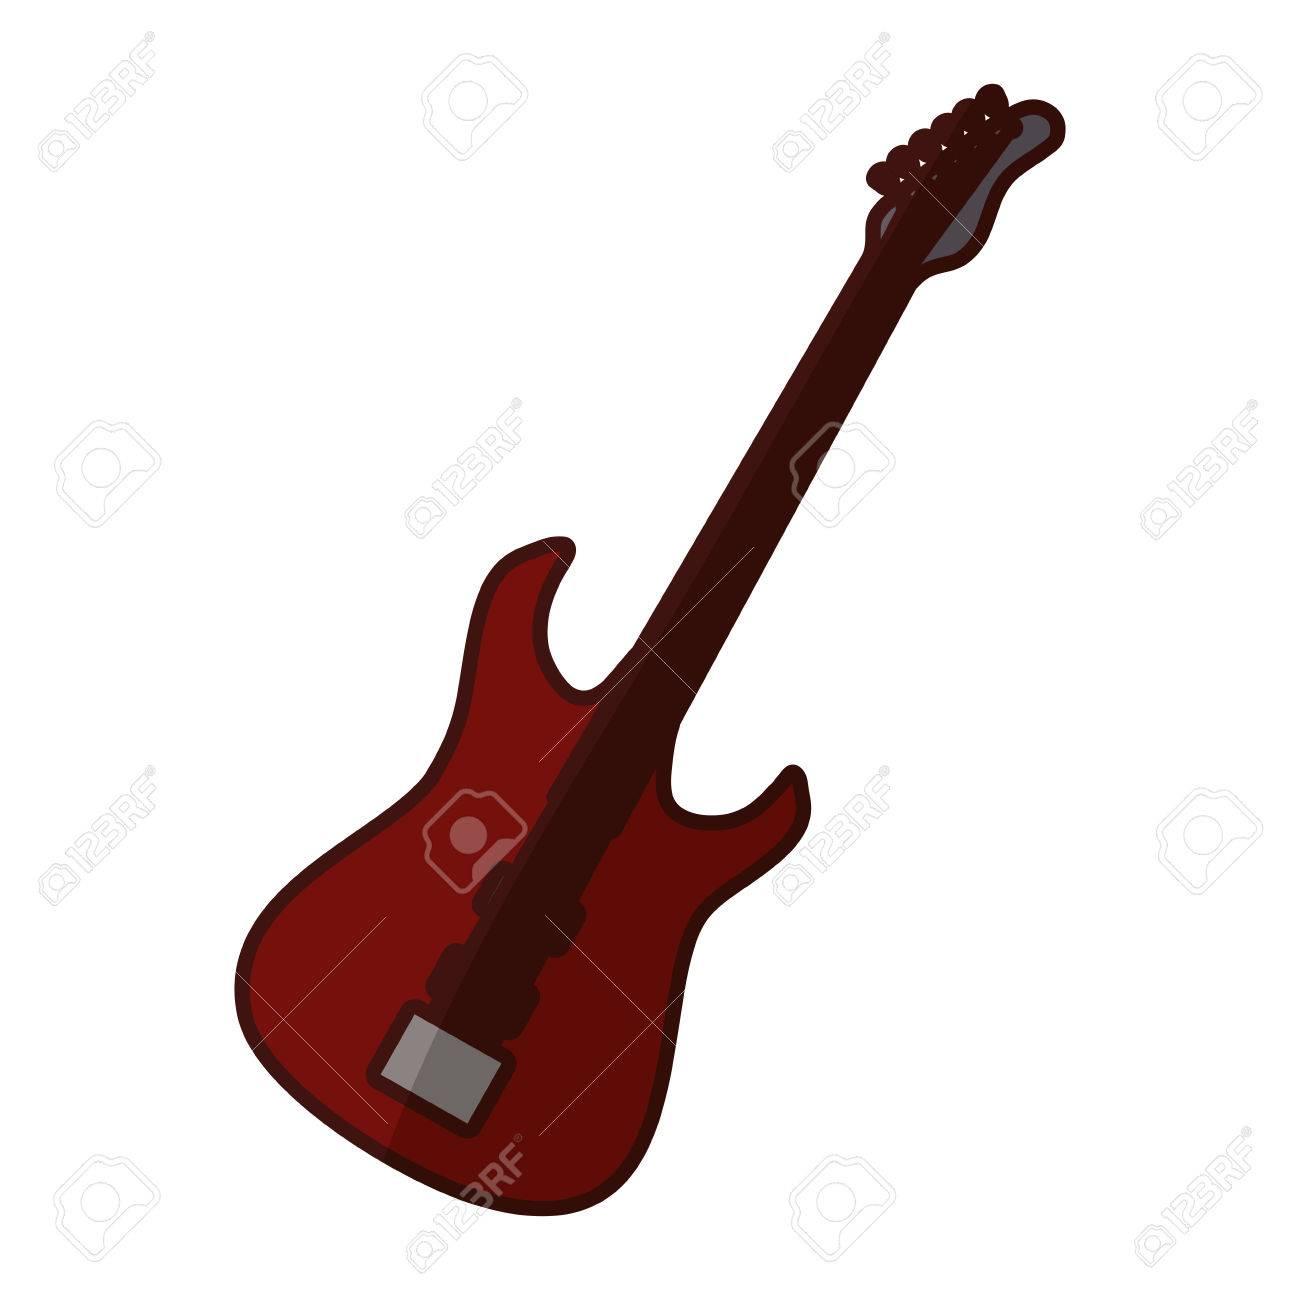 bass guitar icon image vector illustration design royalty free rh 123rf com